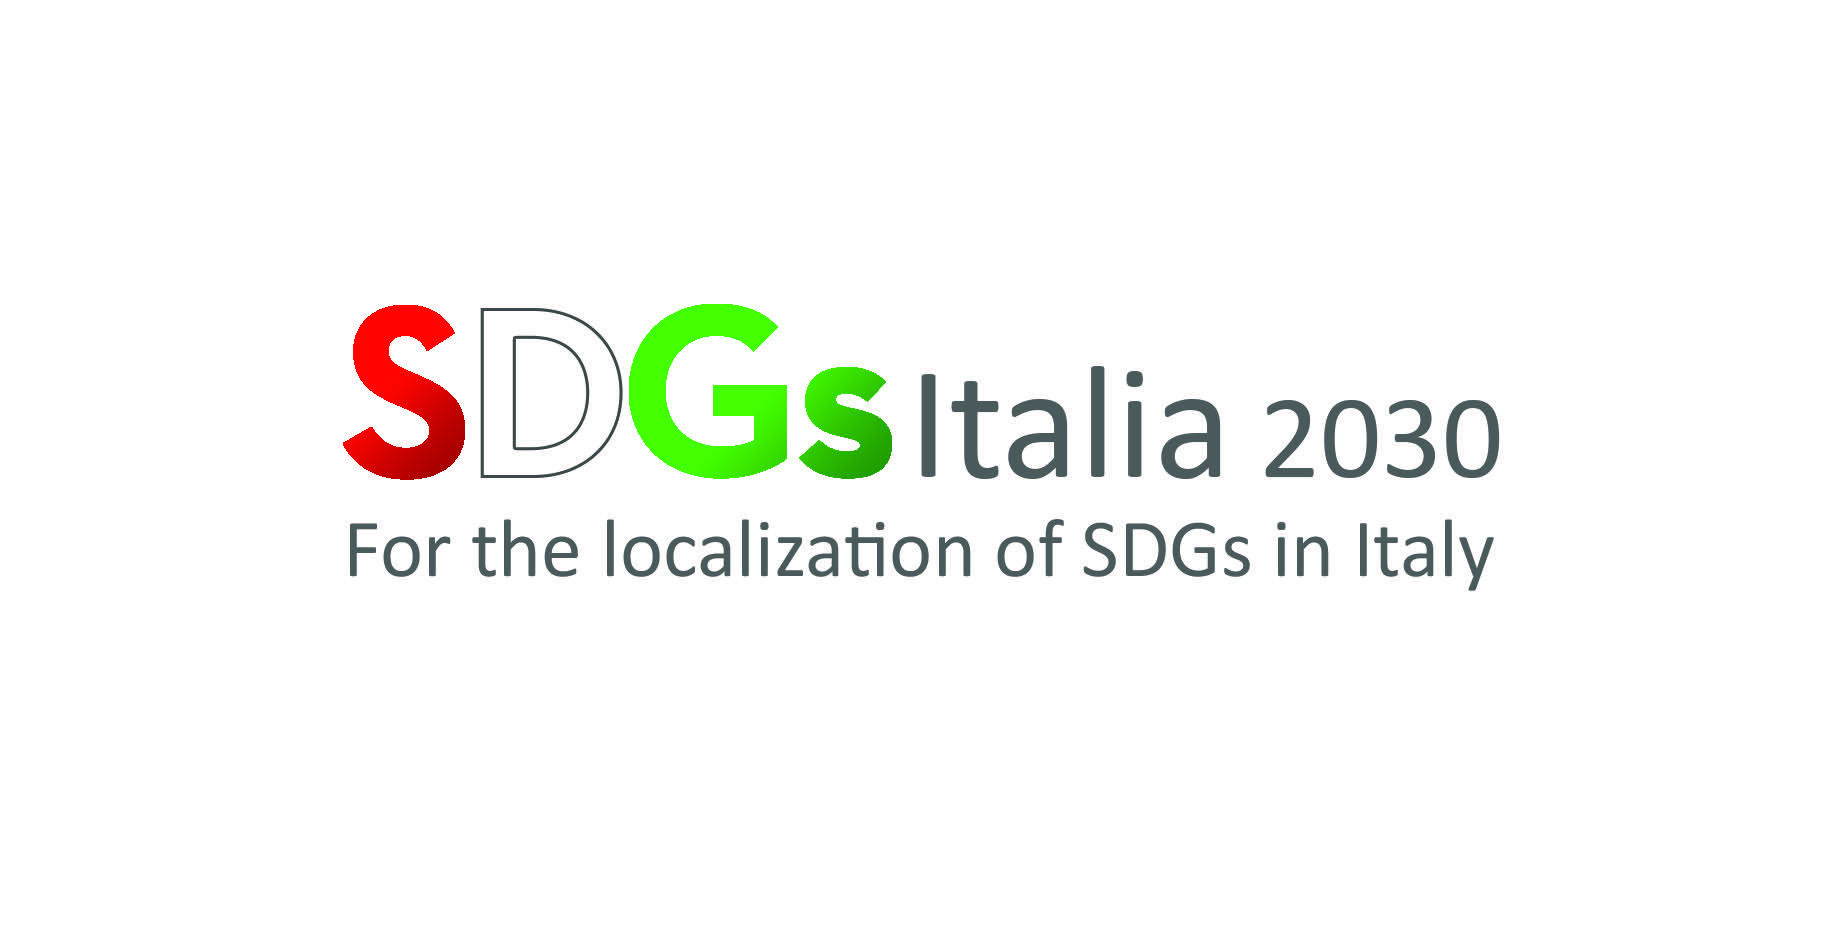 SDGs Italia 2030